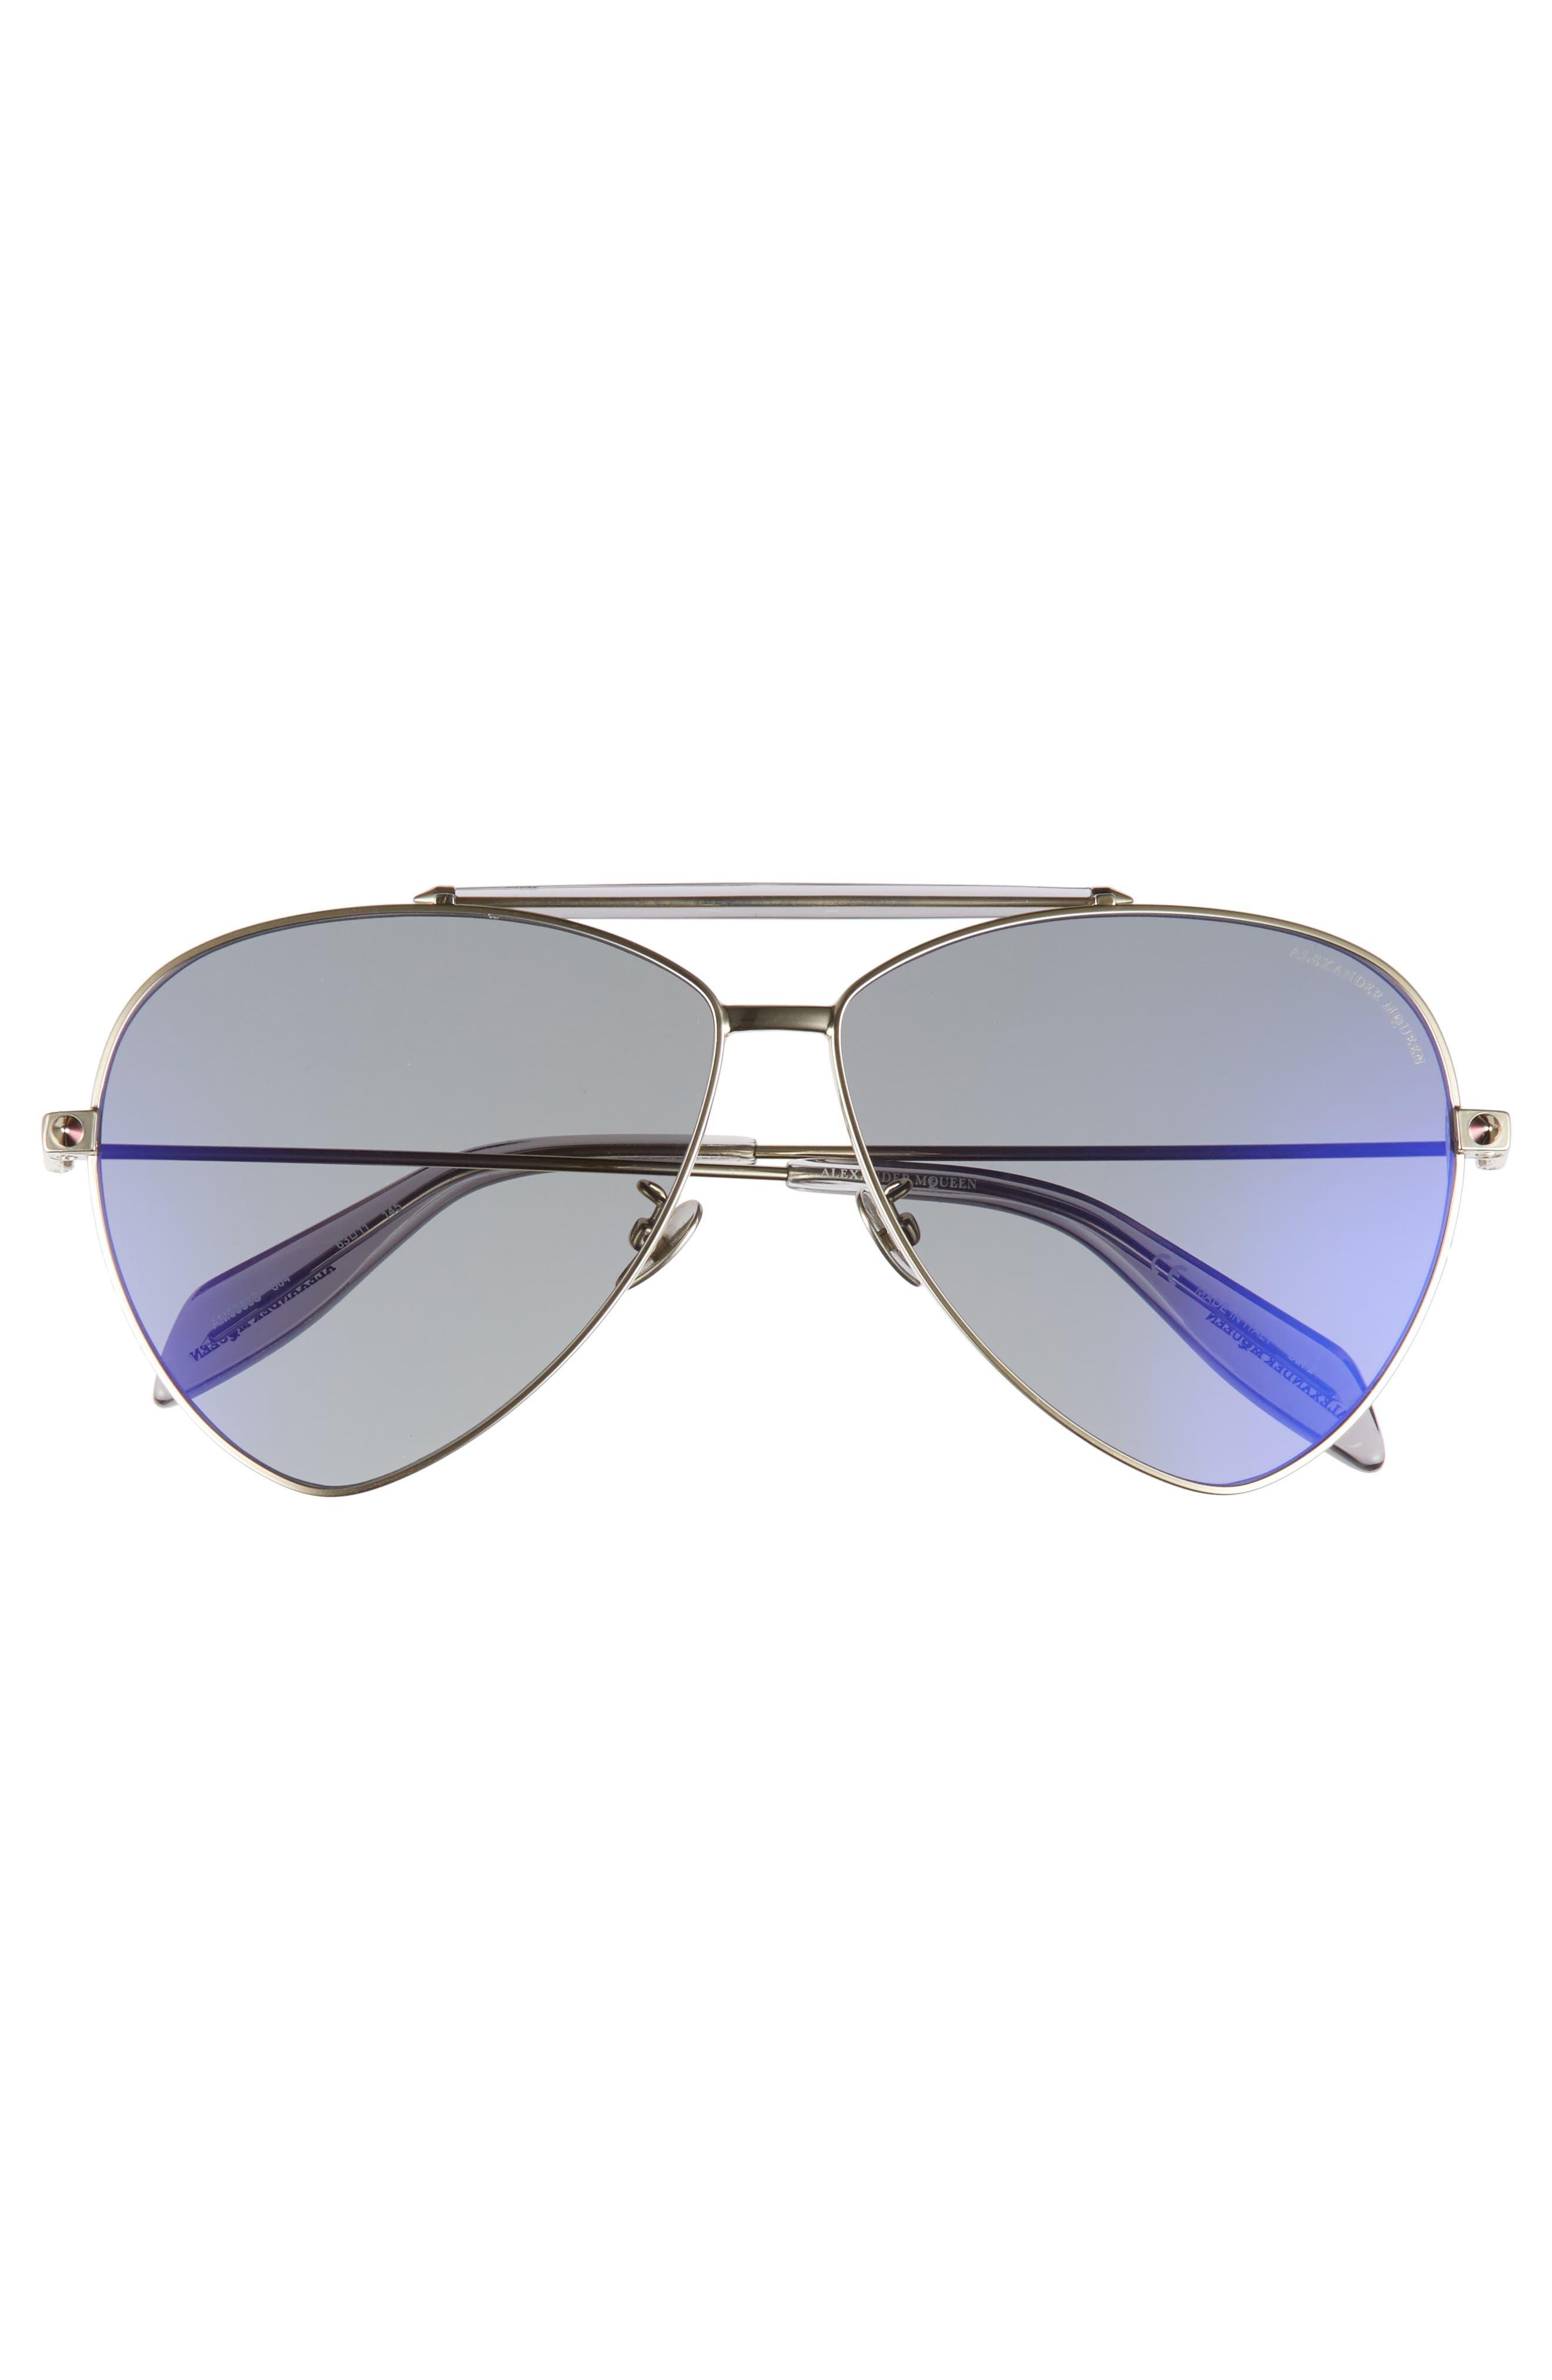 63mm Oversize Aviator Sunglasses,                             Alternate thumbnail 6, color,